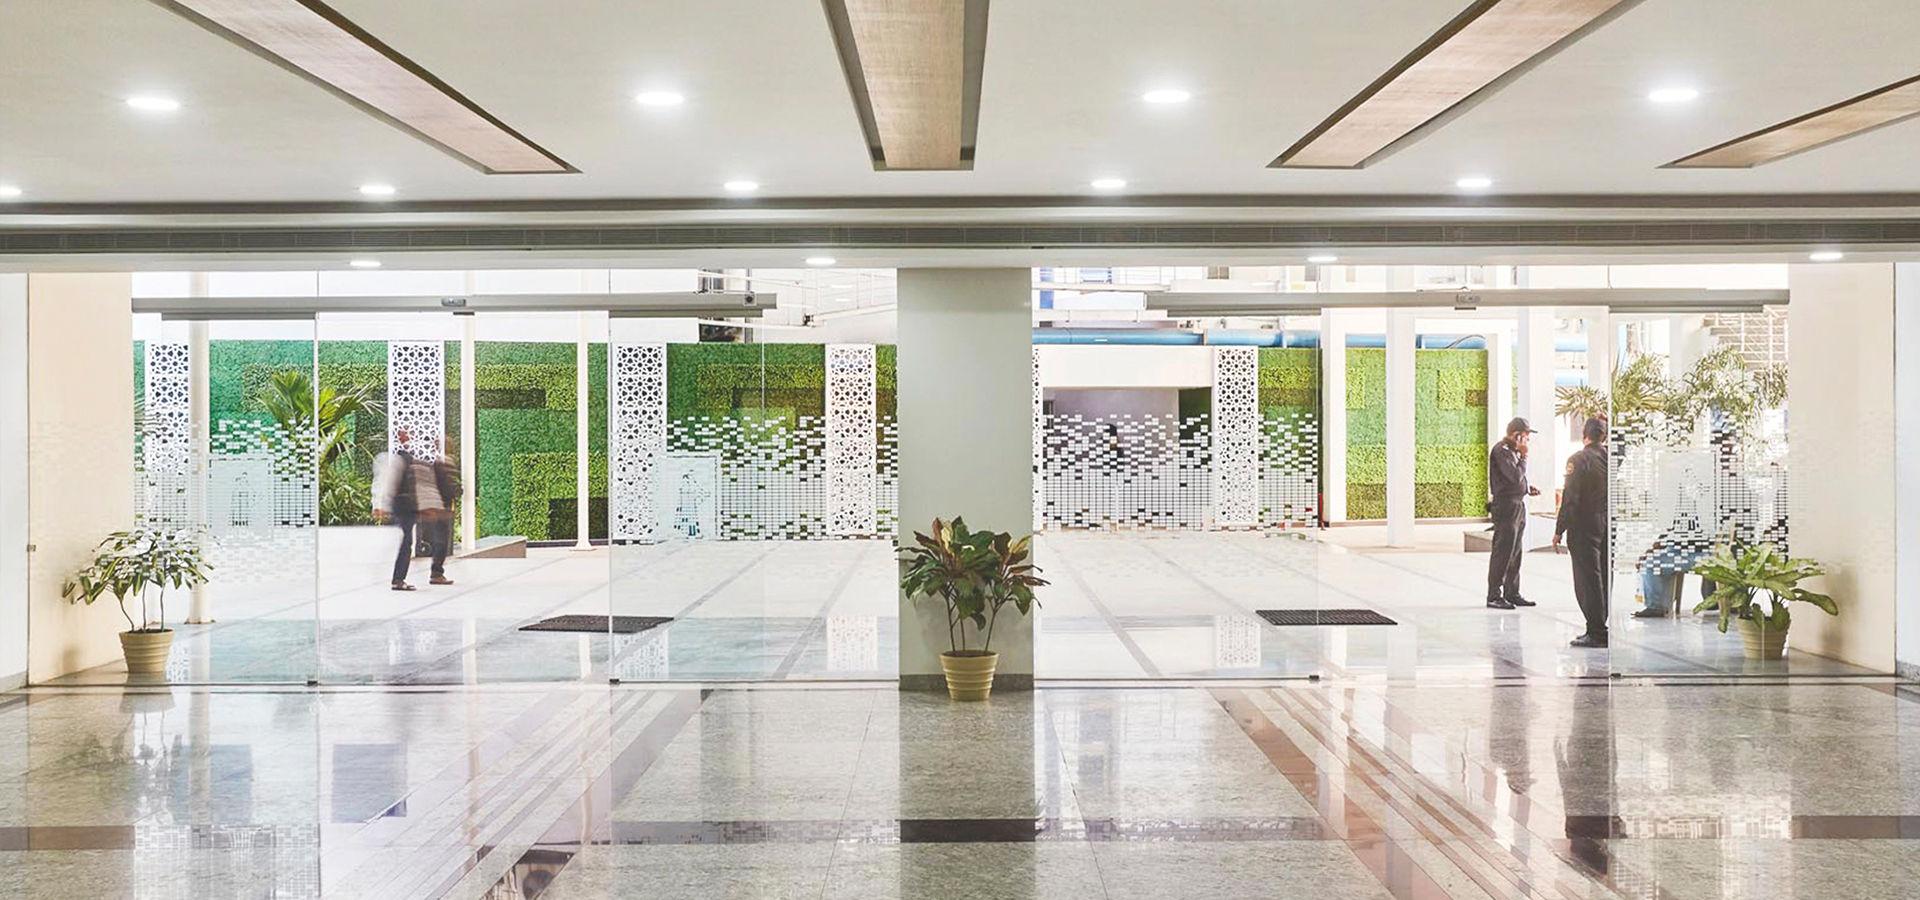 Ramakrishna Care Hospital